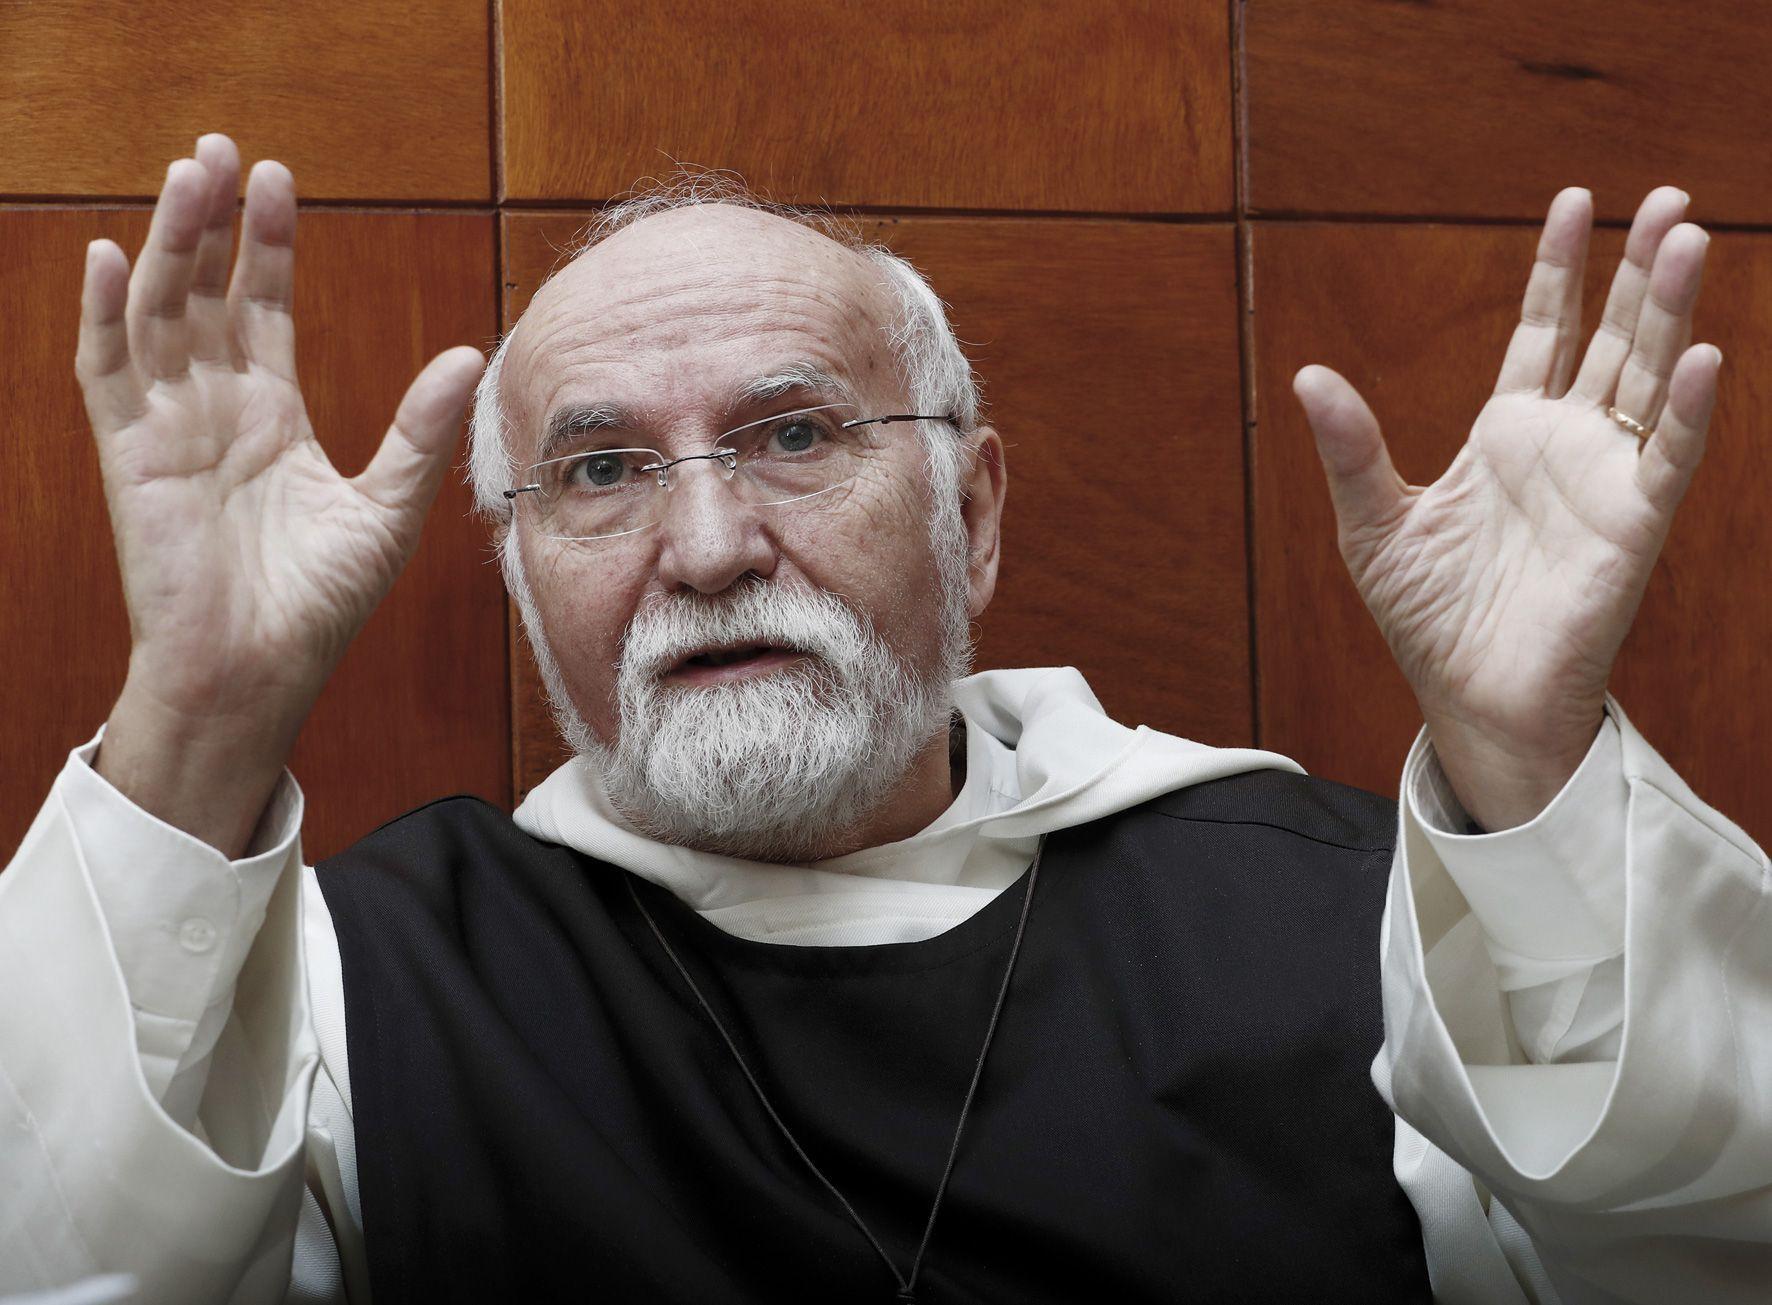 Jacques philippe la santidad del siglo xxi va a ser la santidad de los laicos revista misi n - La paz interior jacques philippe ...